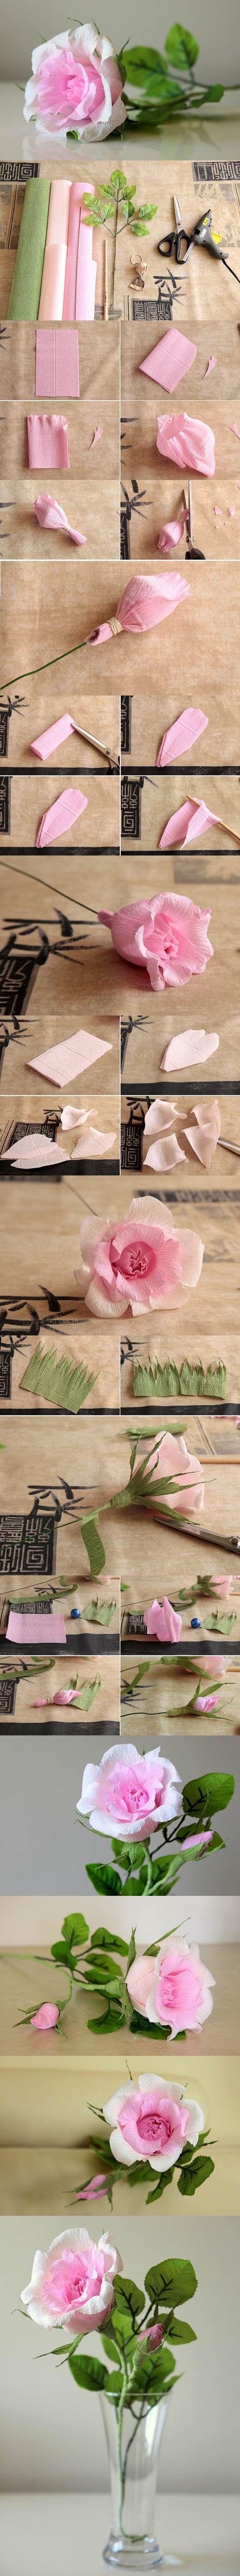 DIY Beautiful Pink Crepe Paper Rose | iCreativeIdeas.com LIKE Us on Facebook ==> https://www.facebook.com/icreativeideas